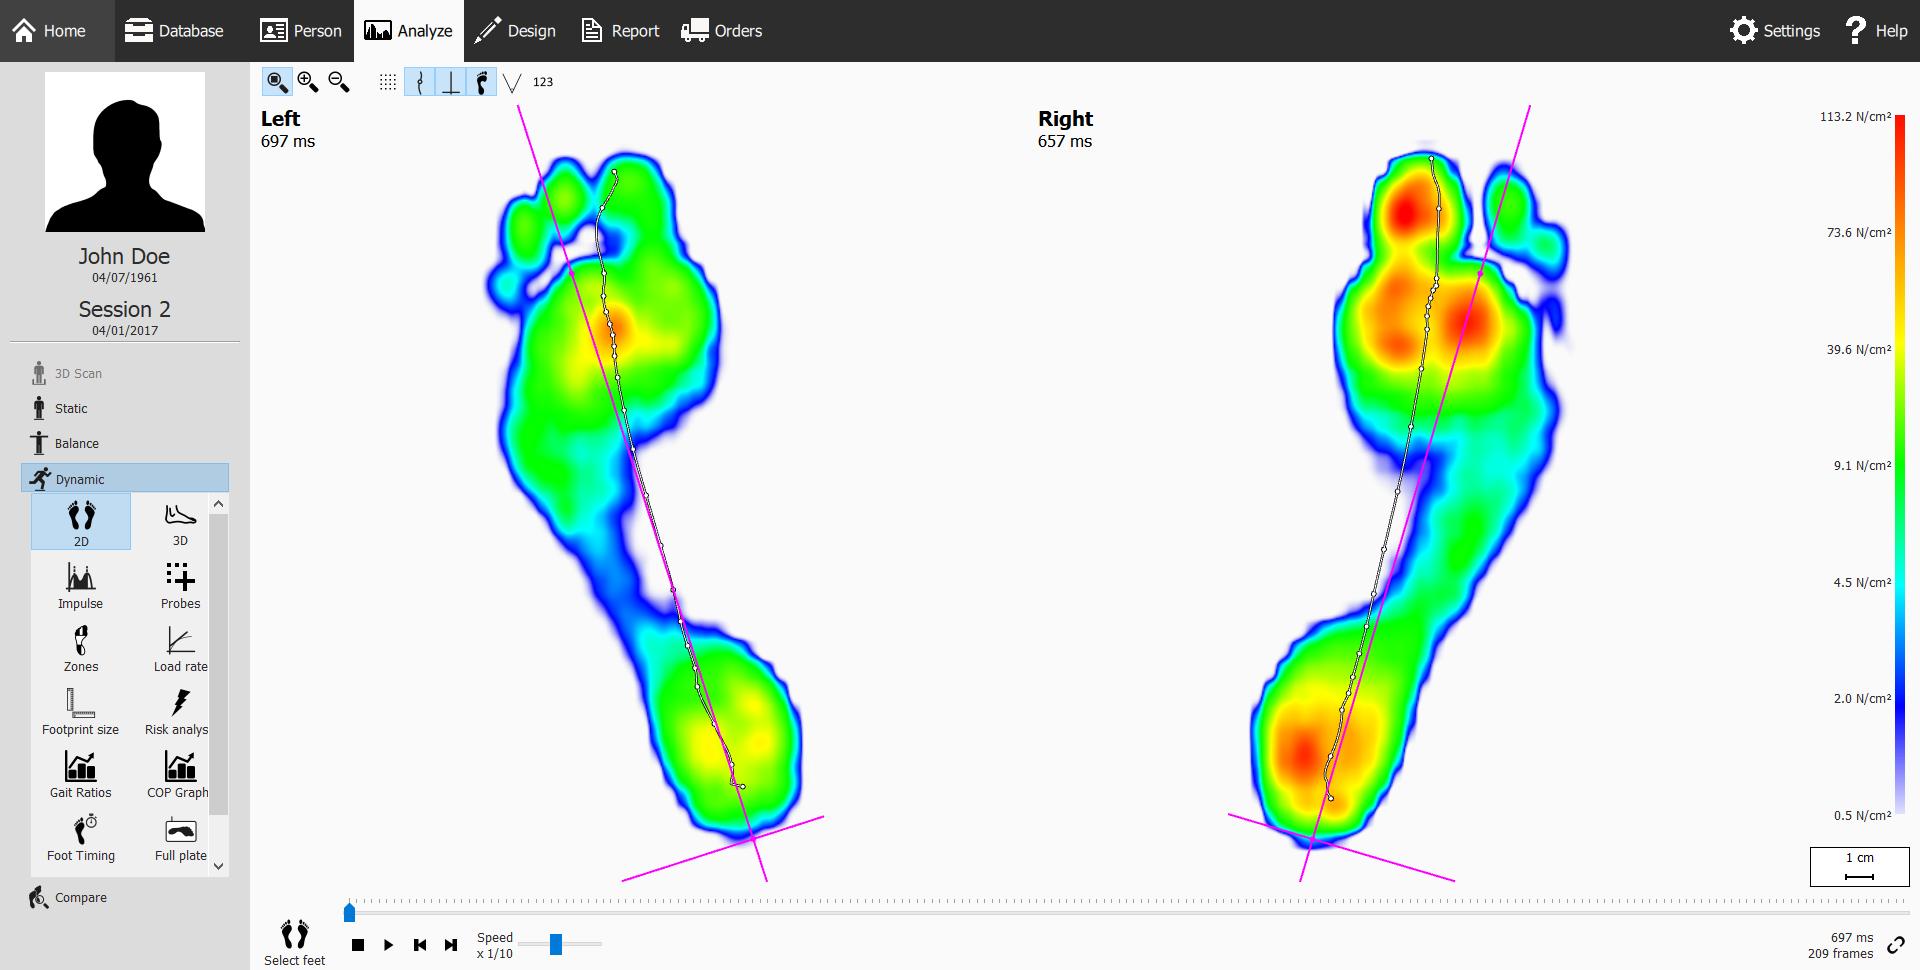 Biomechanics & Dynamic Gait Analysis